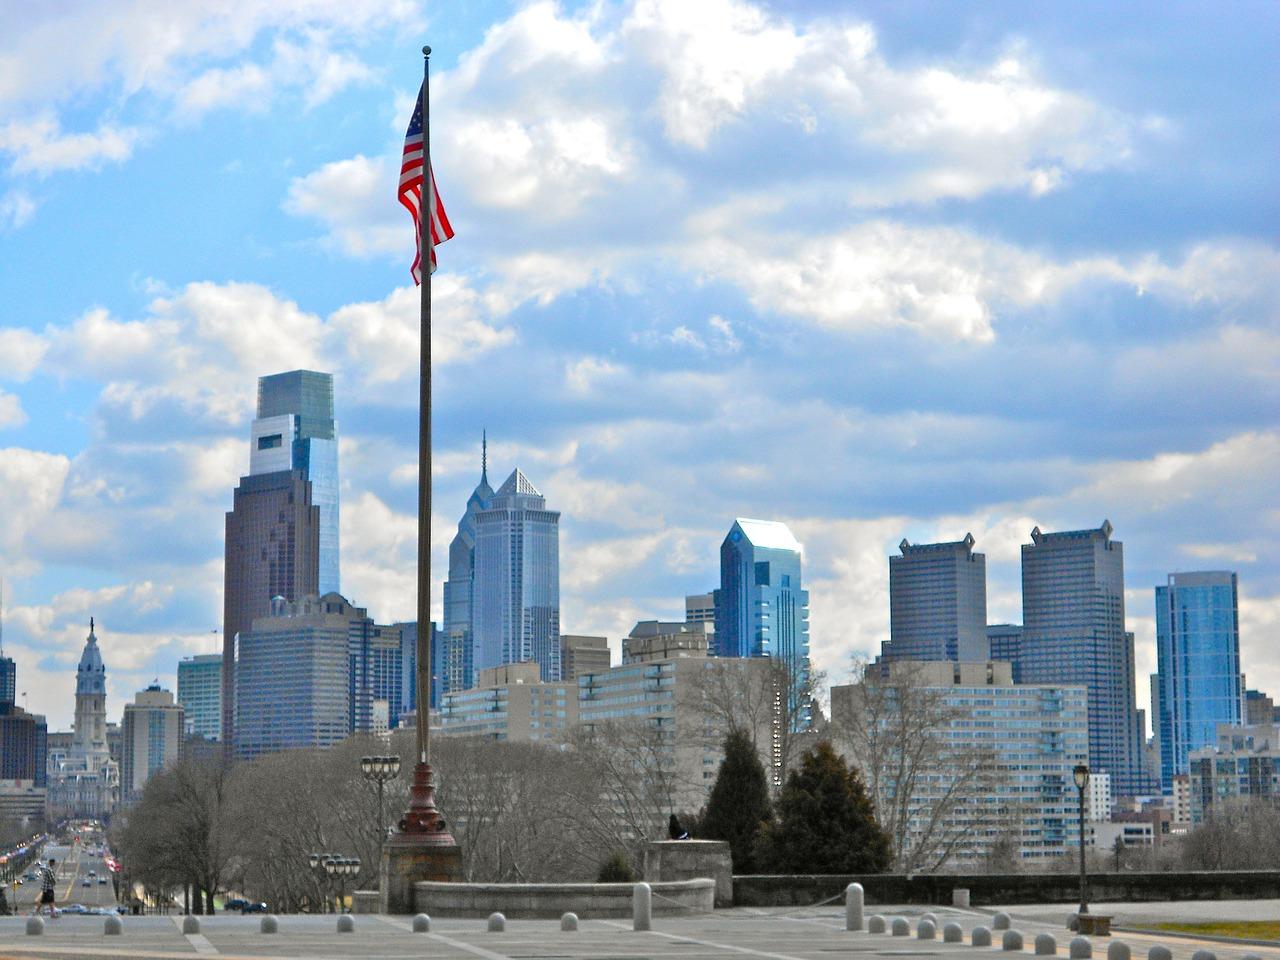 Philadelphia,pennsylvania,sky,clouds,skyscrapers - free image from ...